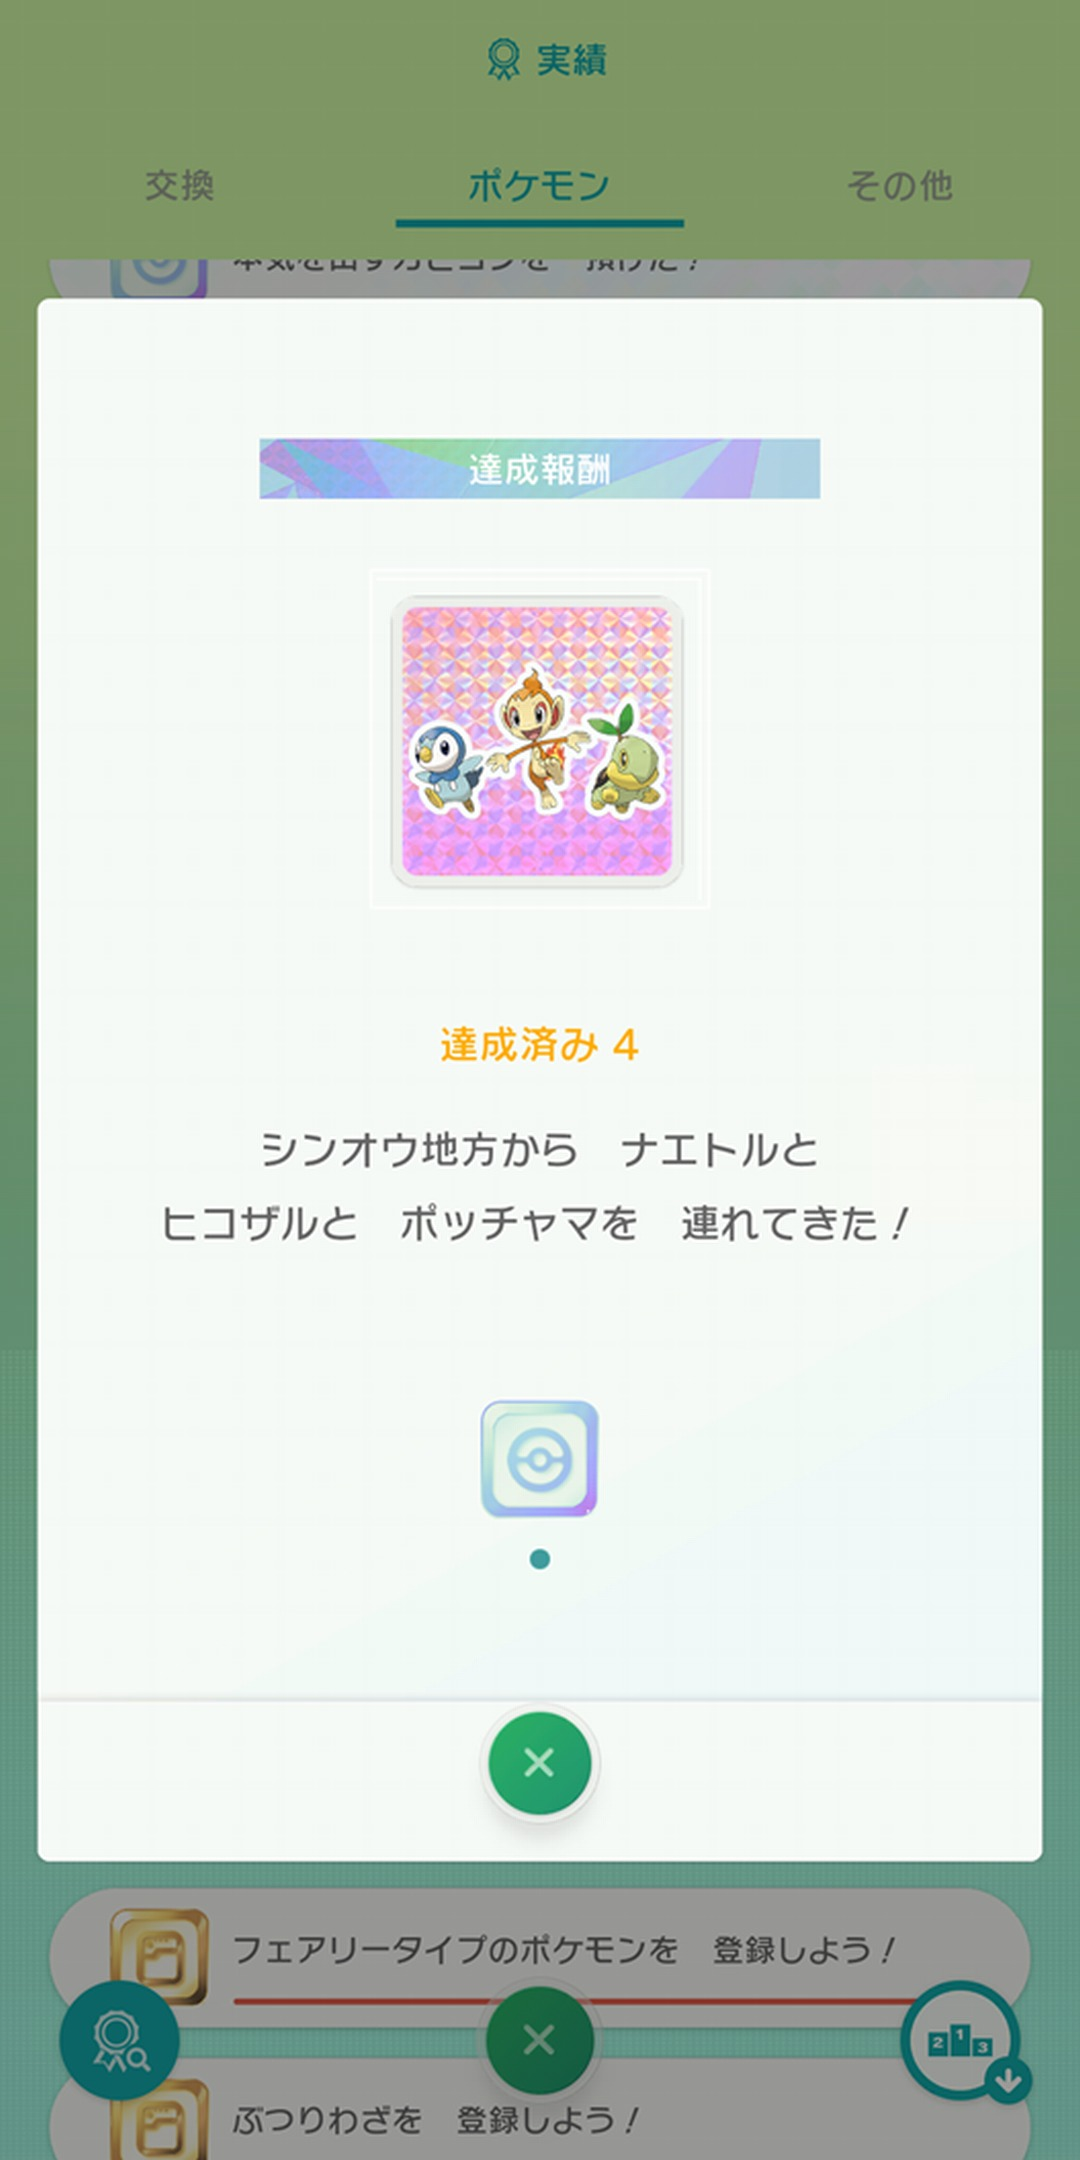 実績 (C)2020 Pokémon. (C)1995-2020 Nintendo/Creatures Inc. /GAME FREAK inc.